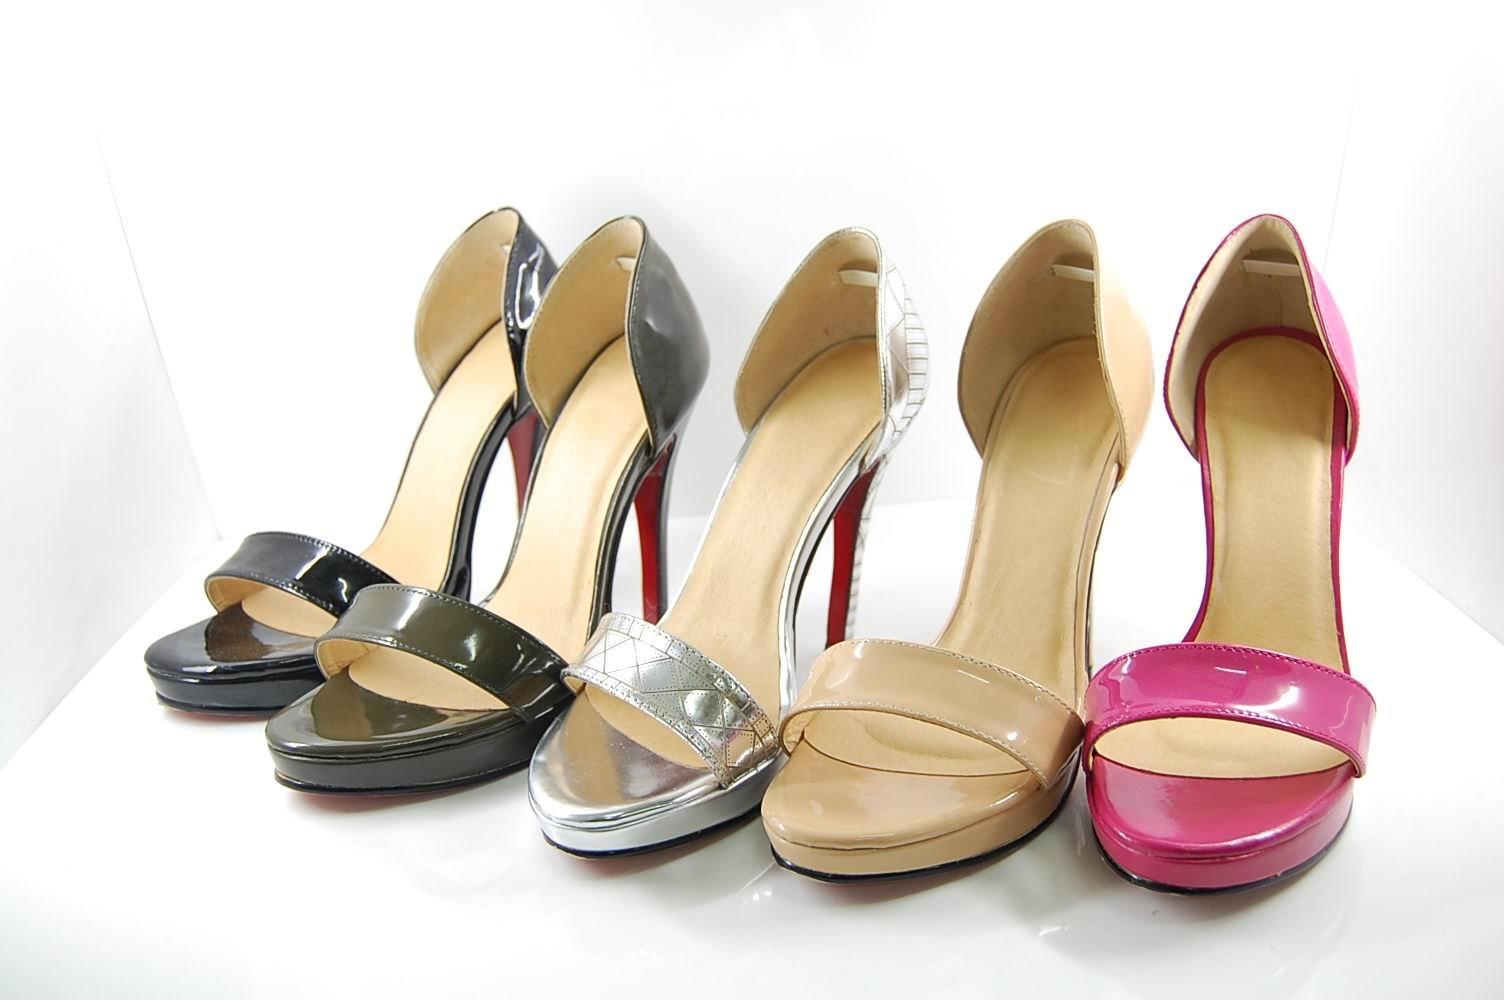 Women's Shoes, Teen Clothing, Hot Shoes, Trendy Dresses, Cute